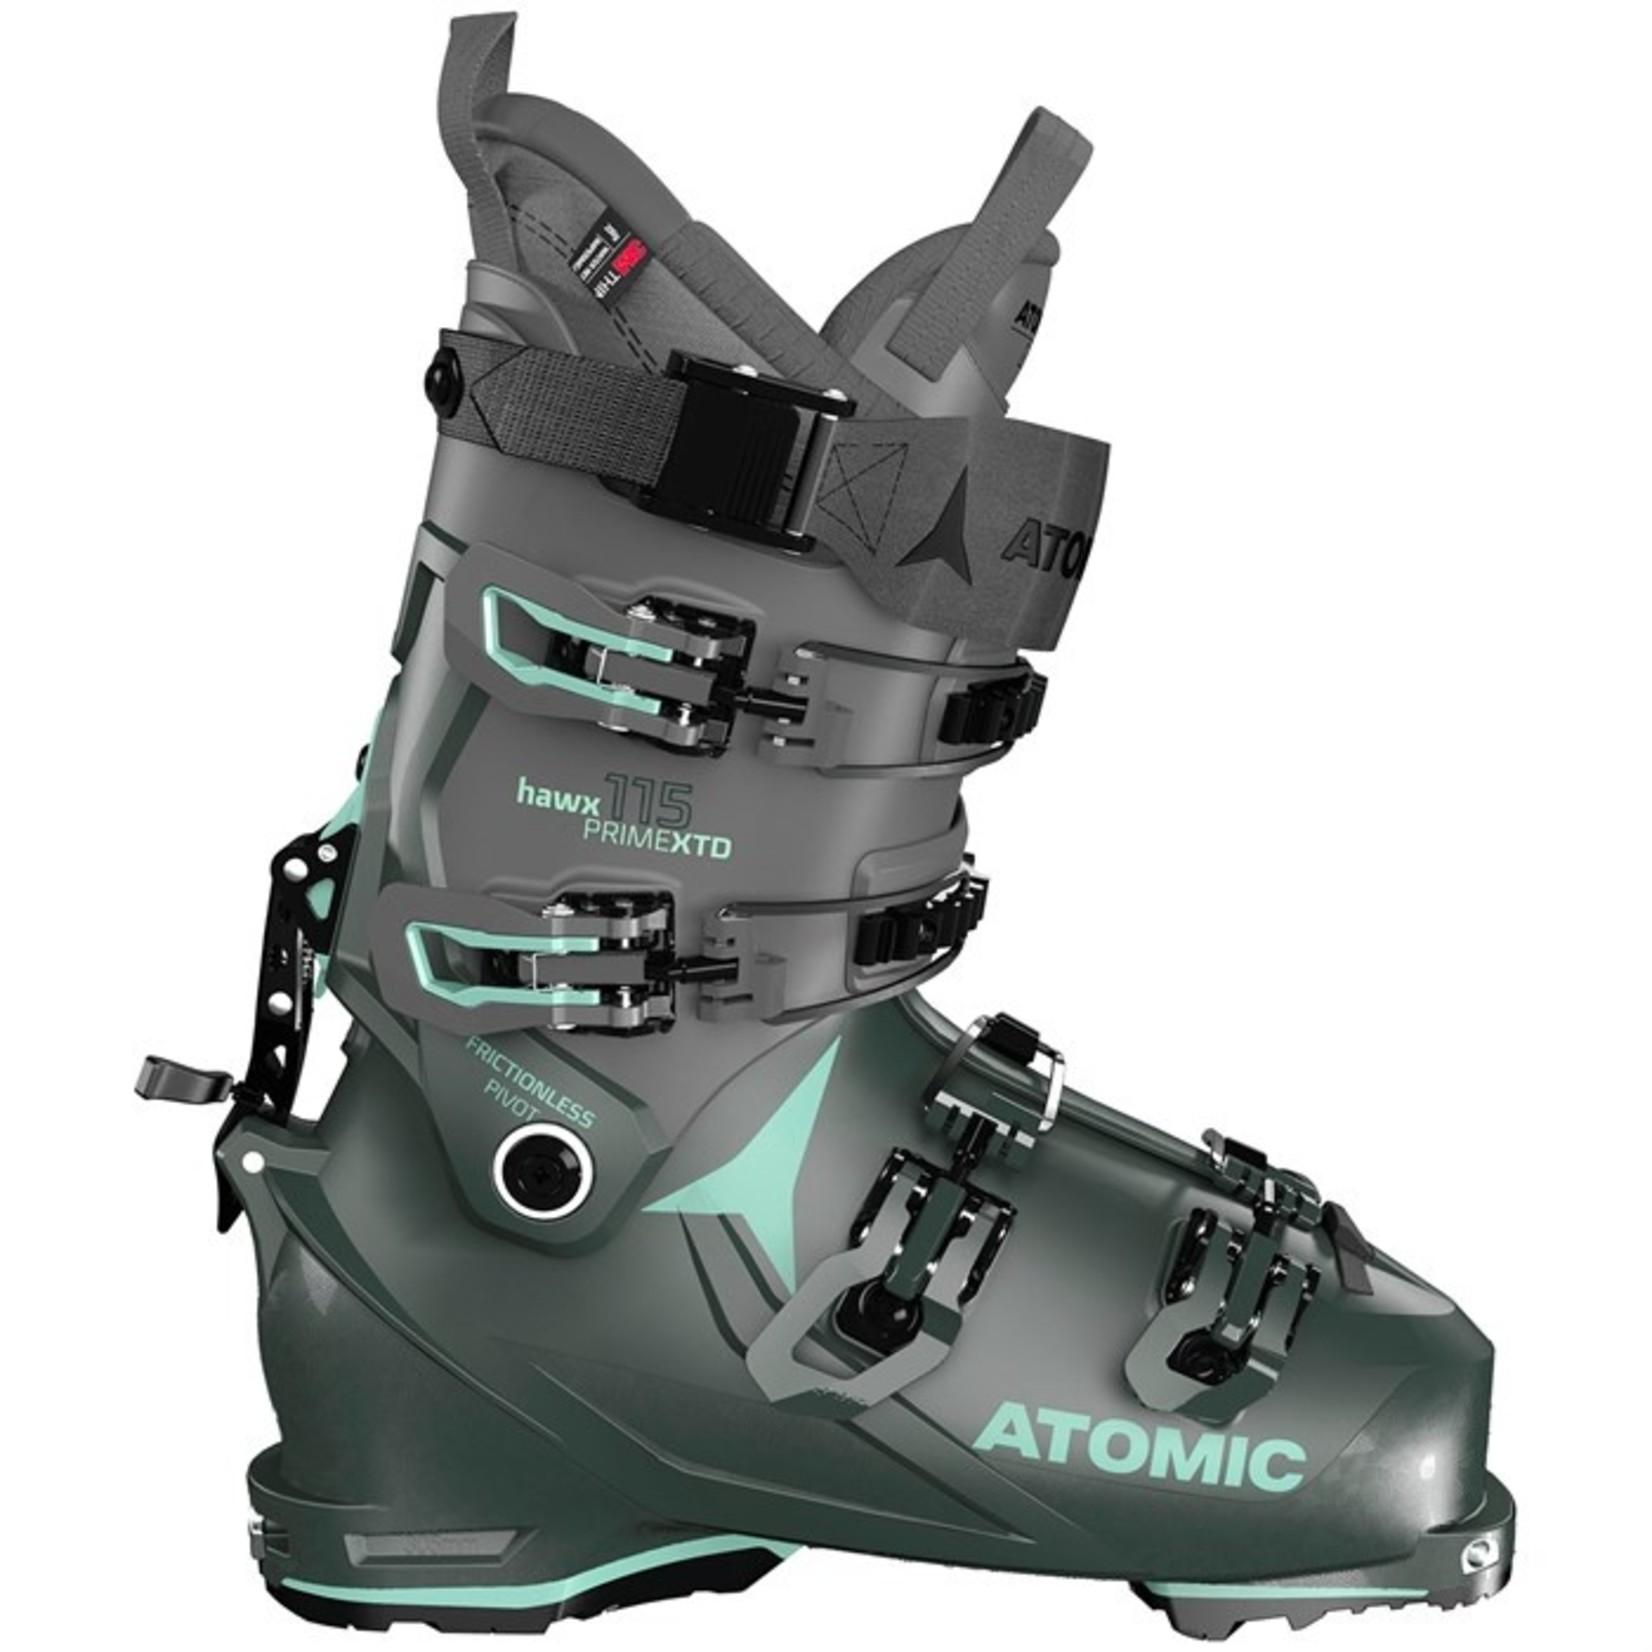 Atomic Atomic Hawx Prime XTD 115 W